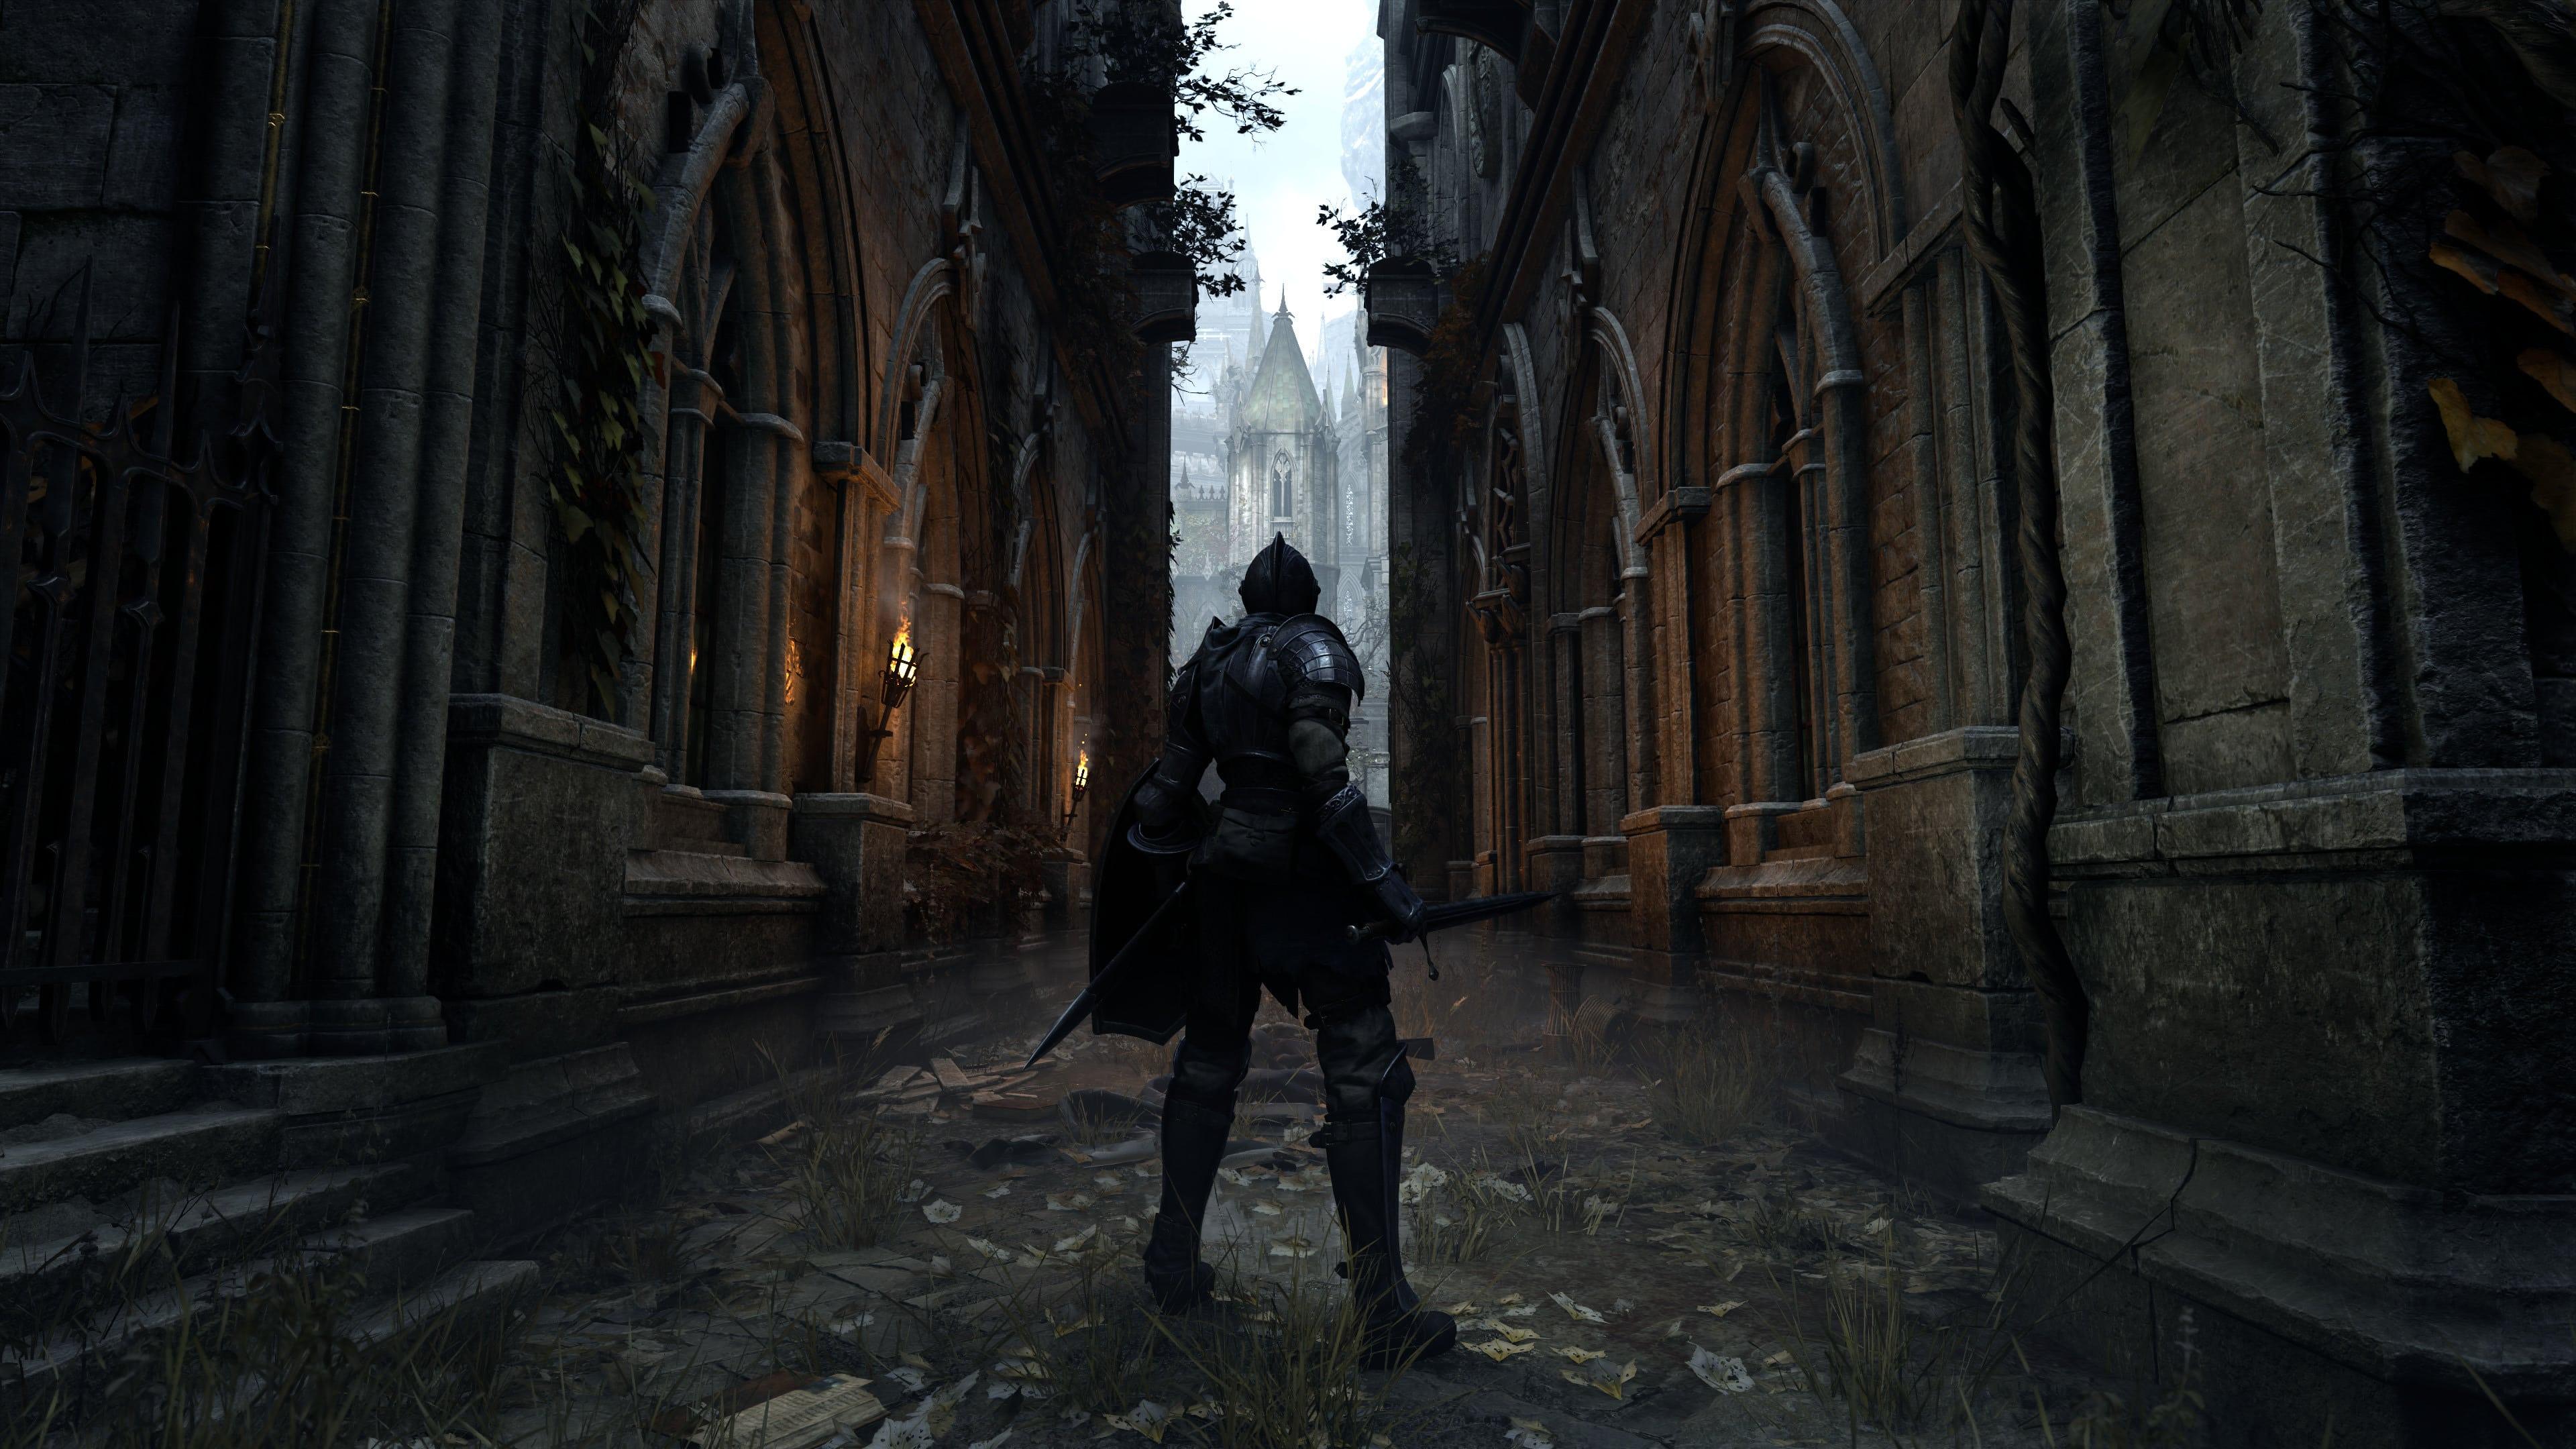 Demon's Souls Remake - PS5 - Wallpapers - 4K